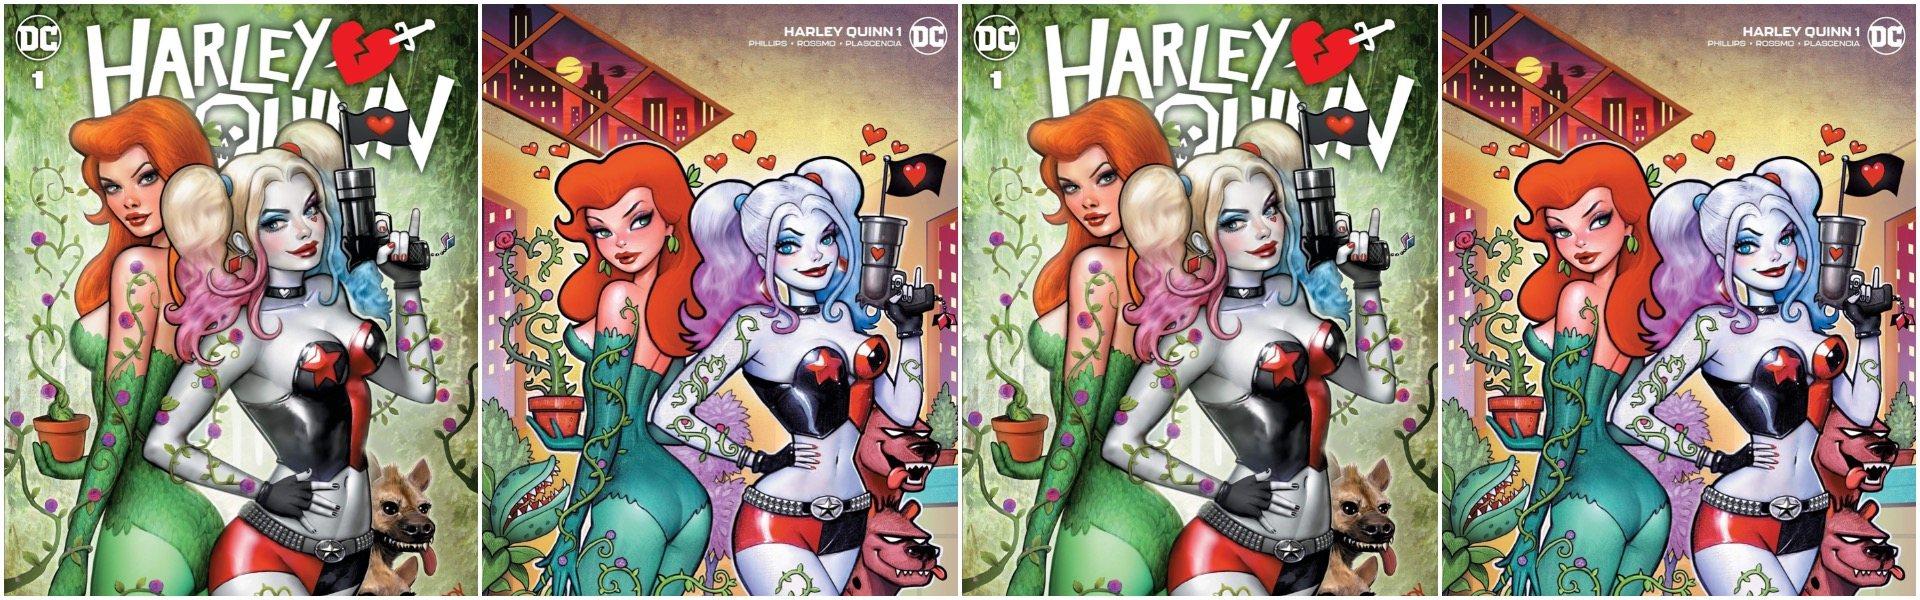 Harley Quinn #1 Nathan Szerdy Variants